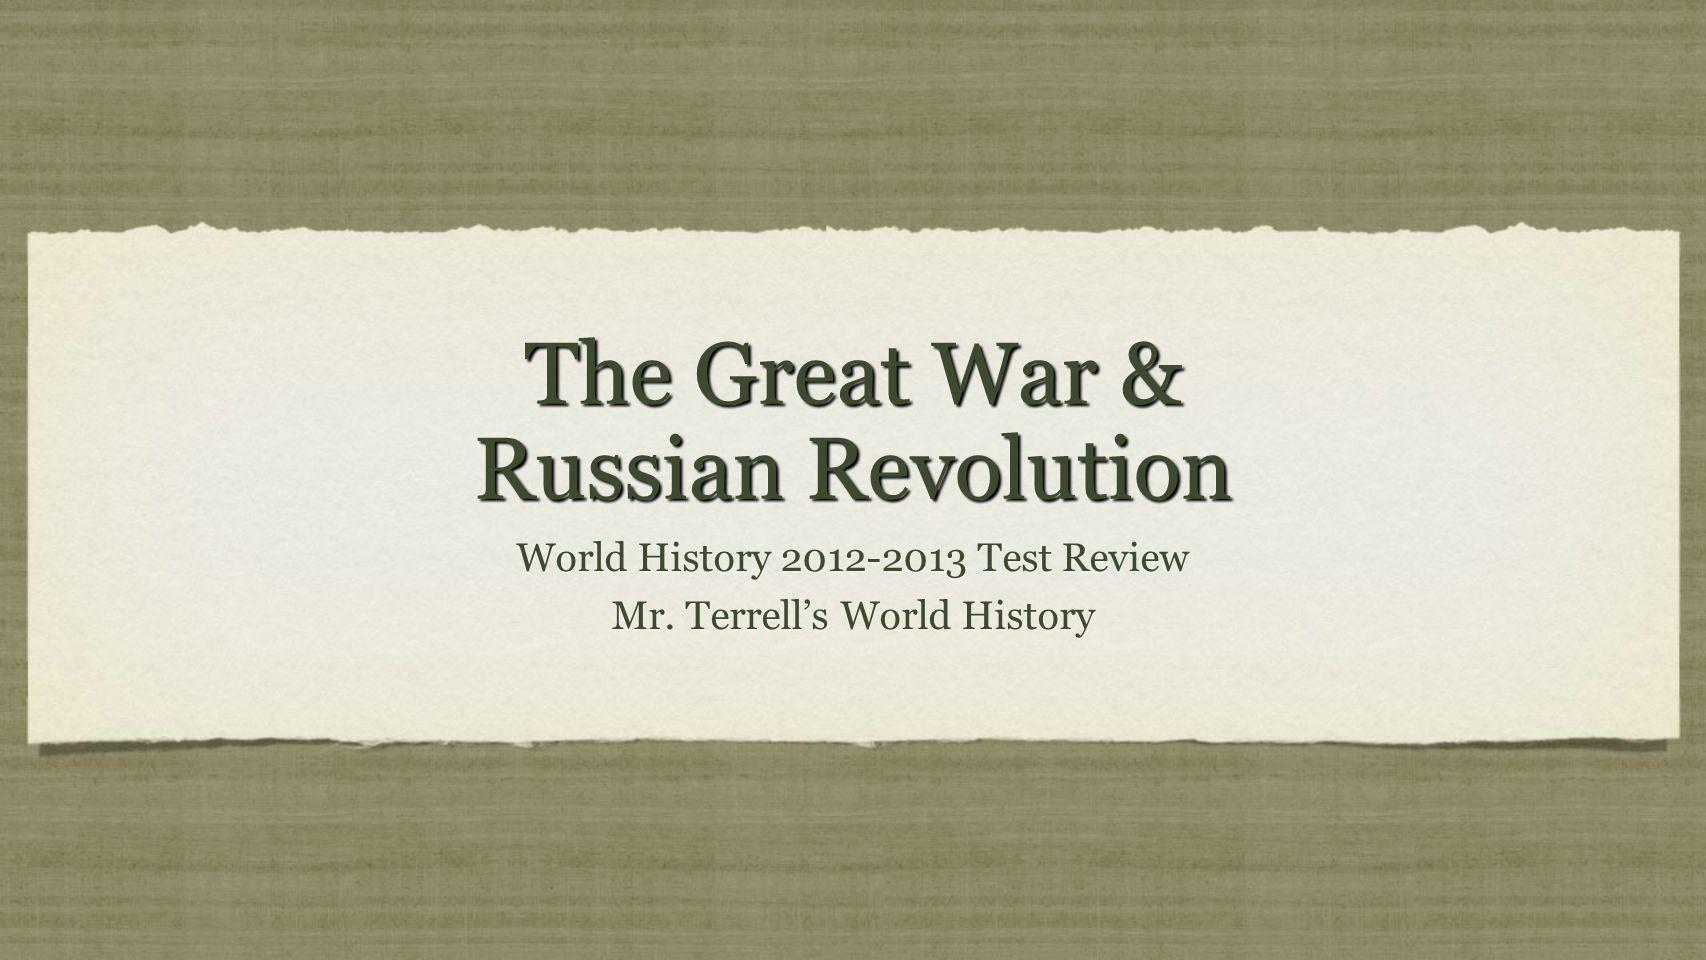 The Great War & Russian Revolution World History 2012-2013 Test Review Mr. Terrells World History World History 2012-2013 Test Review Mr. Terrells Wor